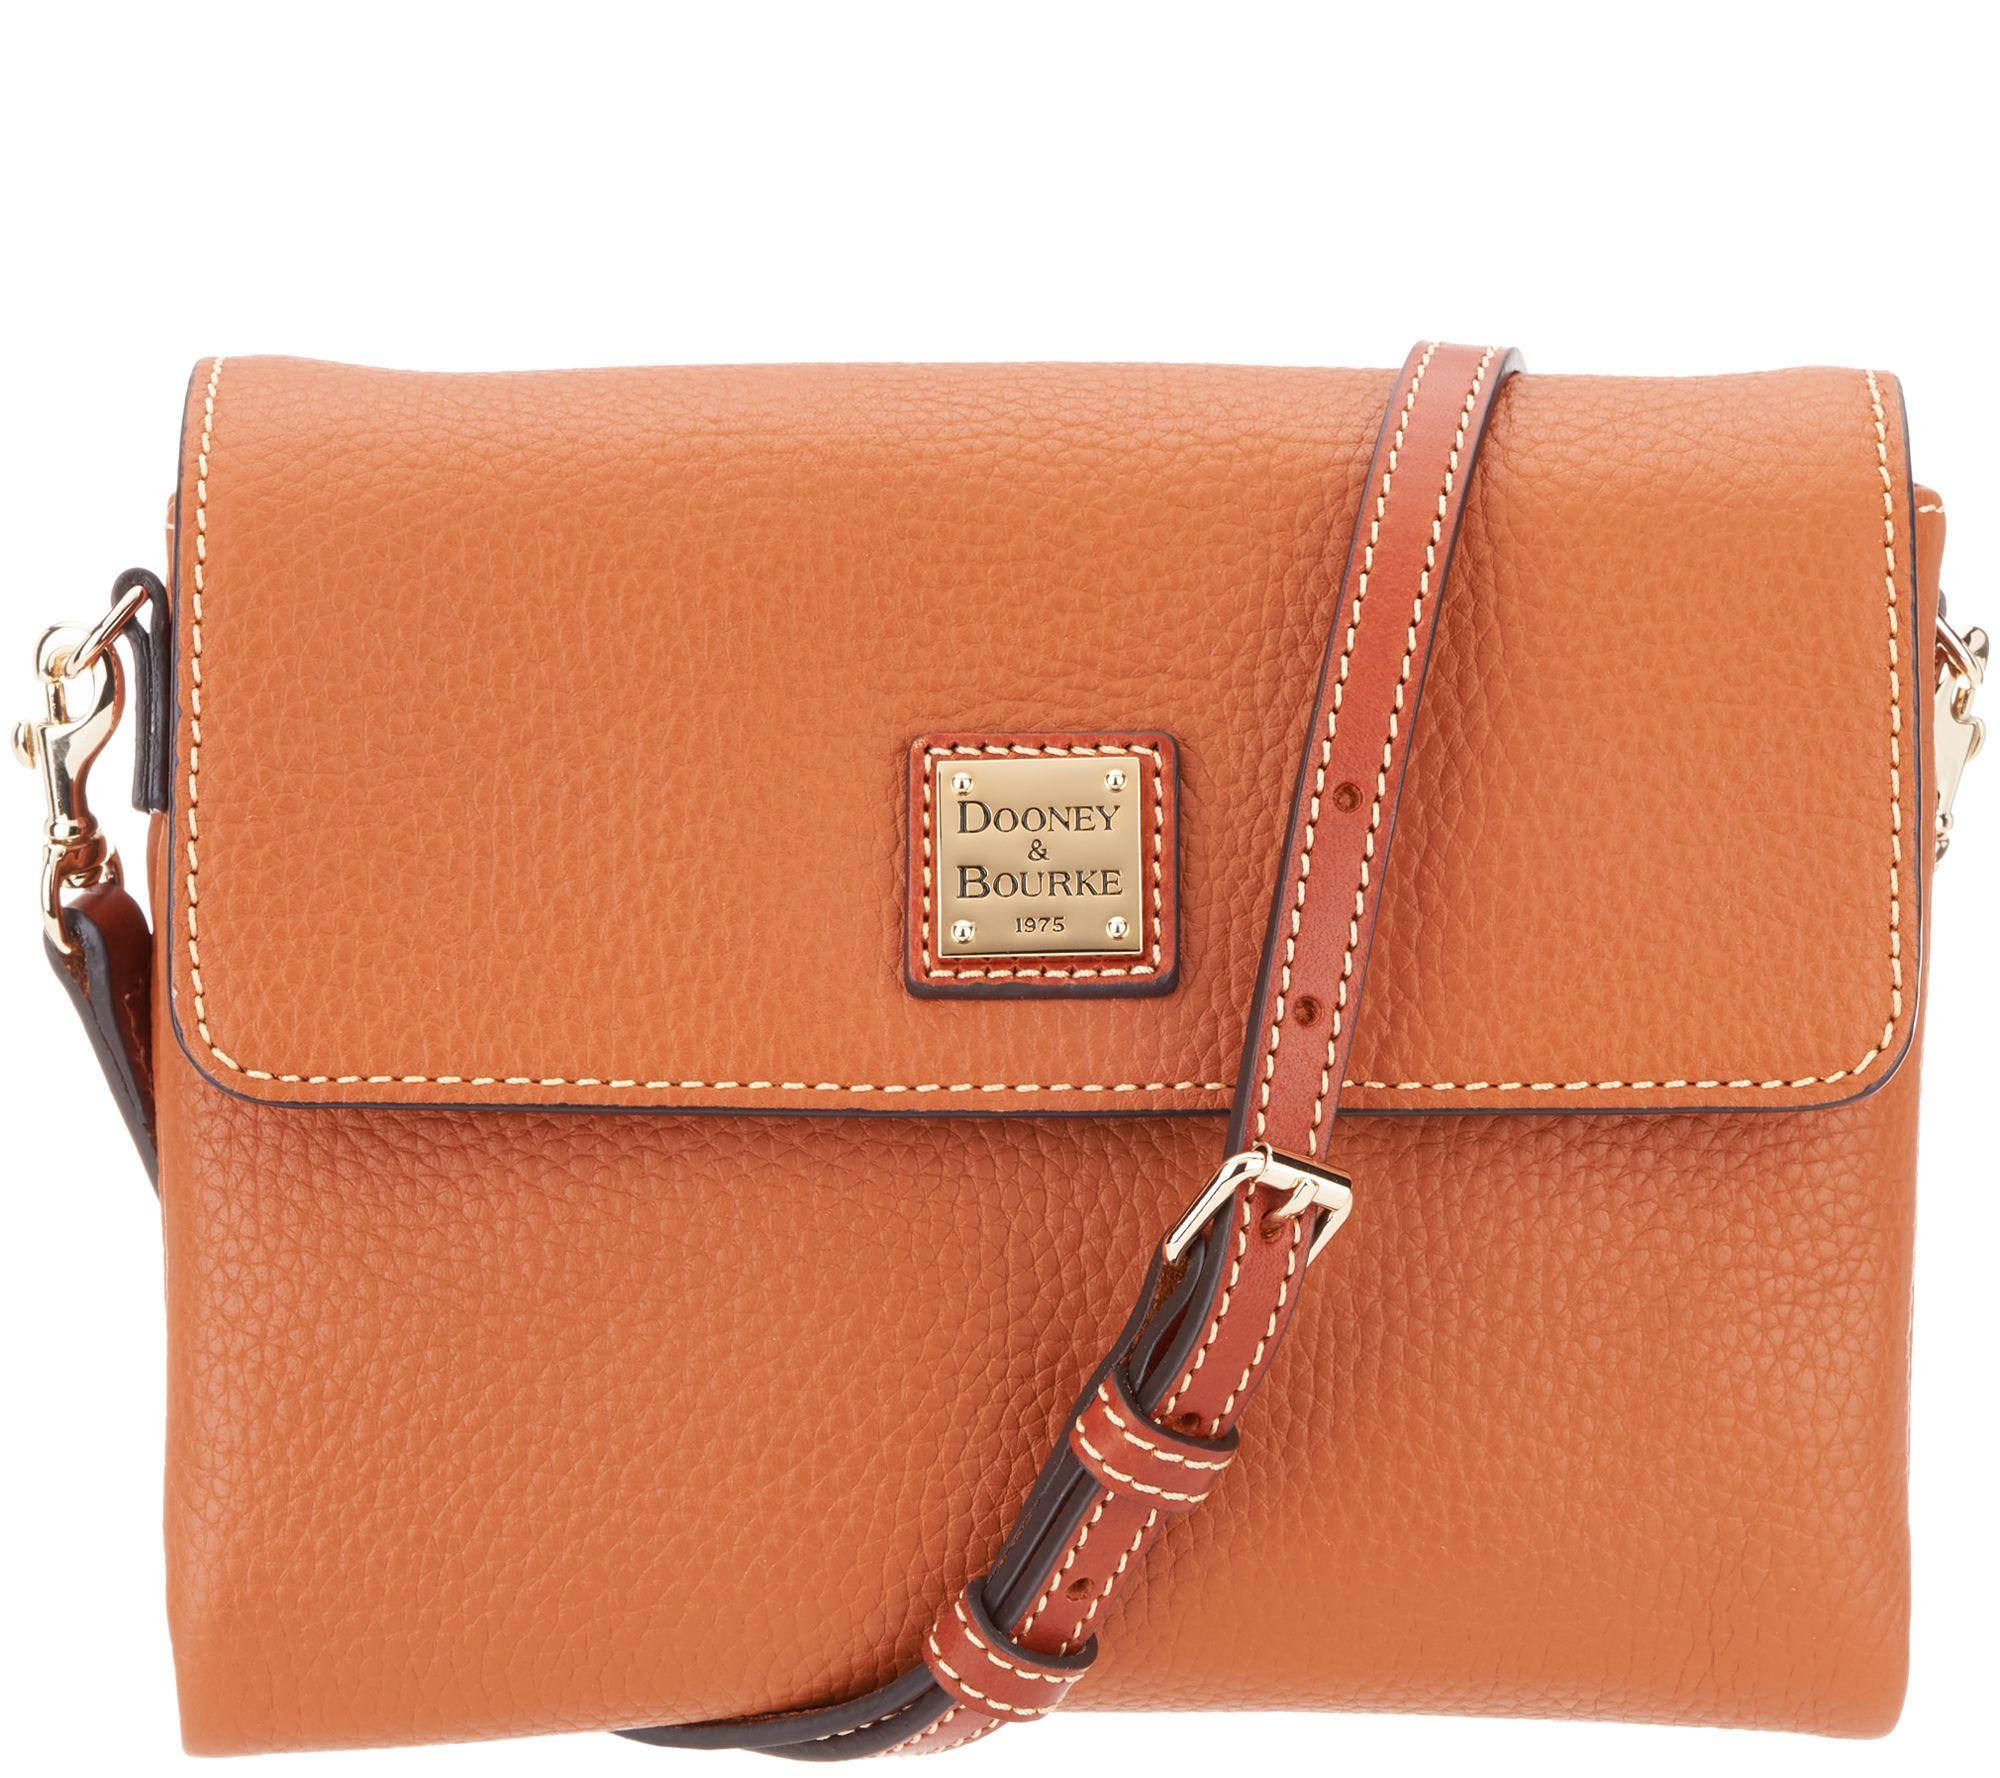 Dooney   Bourke Pebble Leather Crossbody Handbag - Hunter - Page 1 — QVC.com 4c6ef10e6fc5d